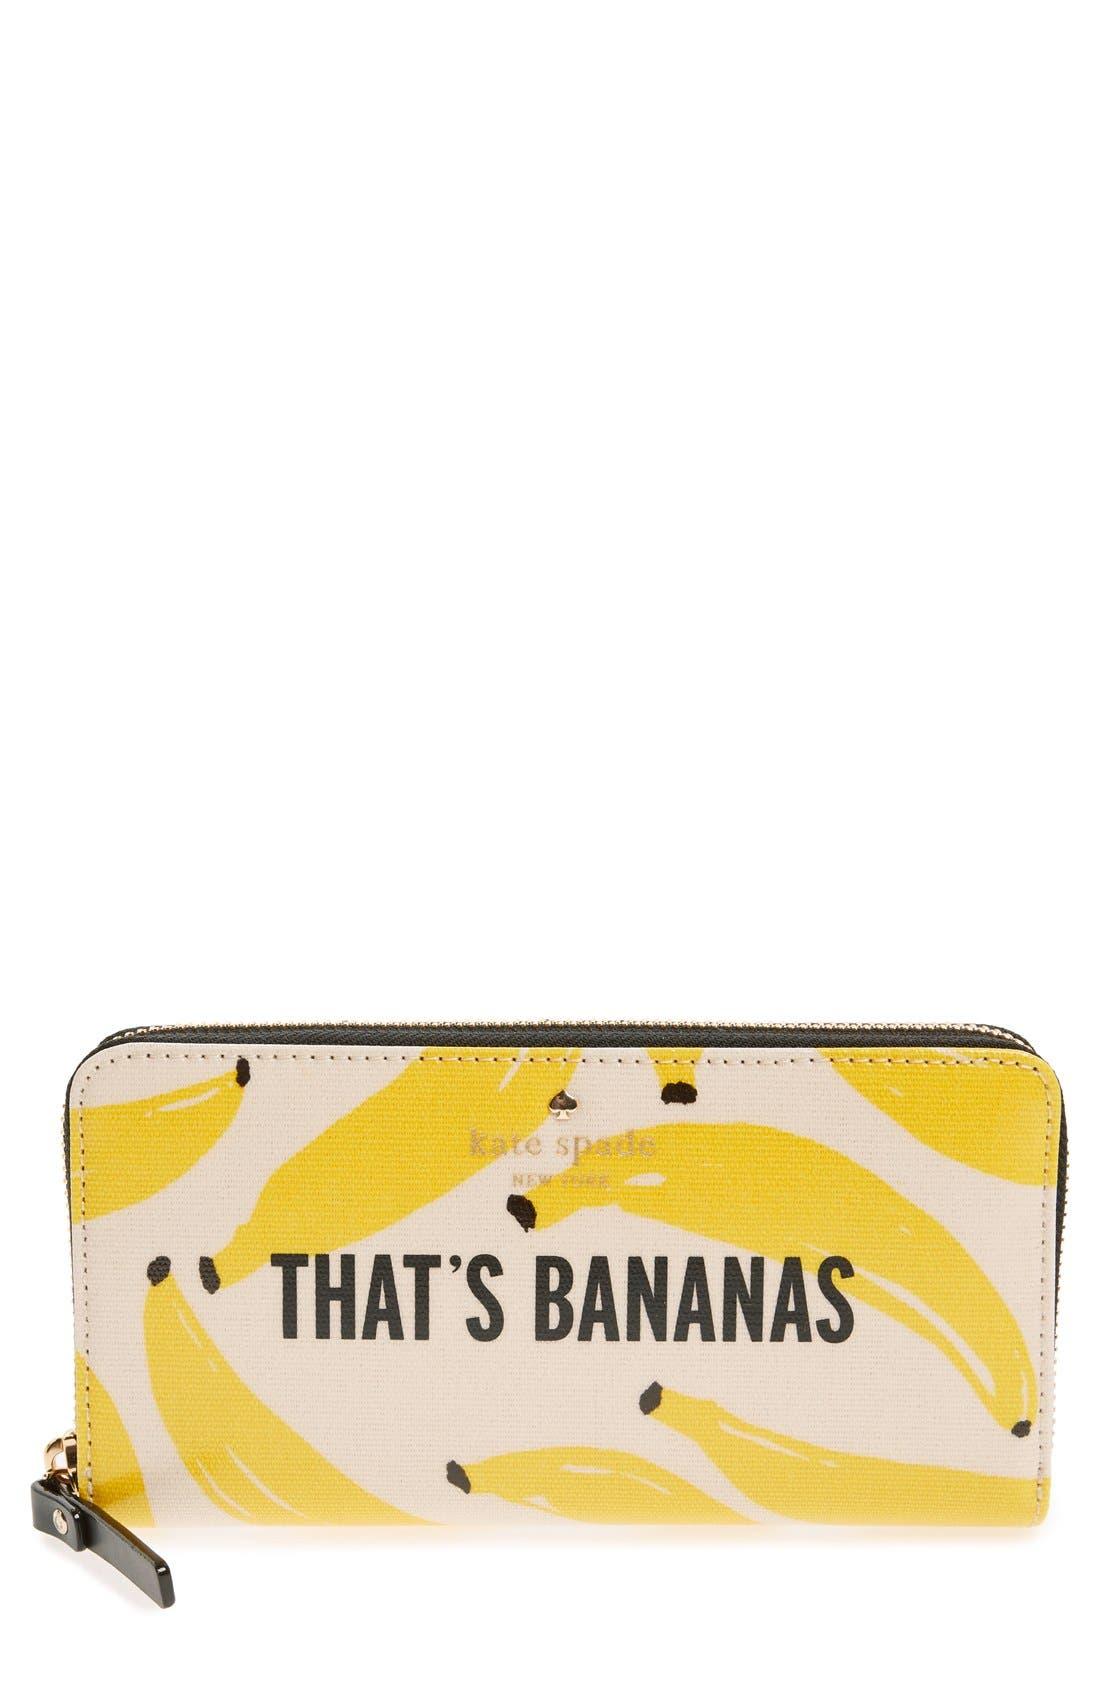 Main Image - kate spade new york 'that's bananas - lacey' zip around wallet